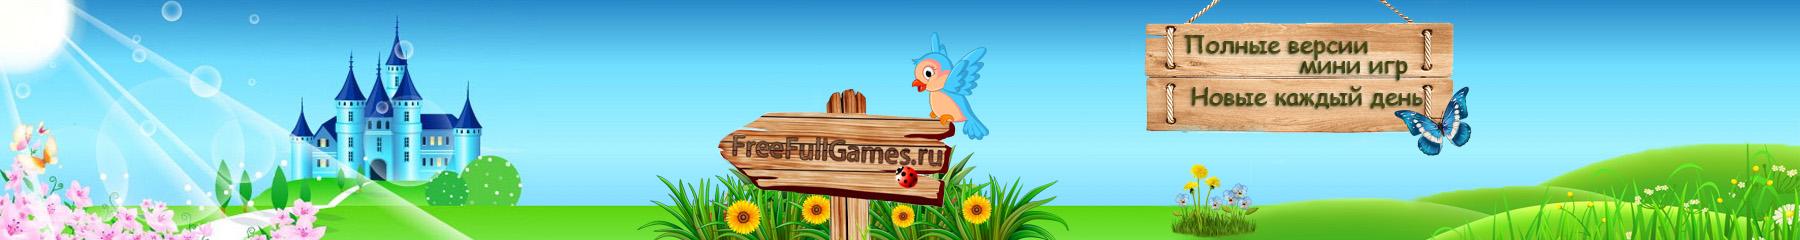 FreeFullGames.ru -������ ������ ��� ������� ��������� � ��� �����������